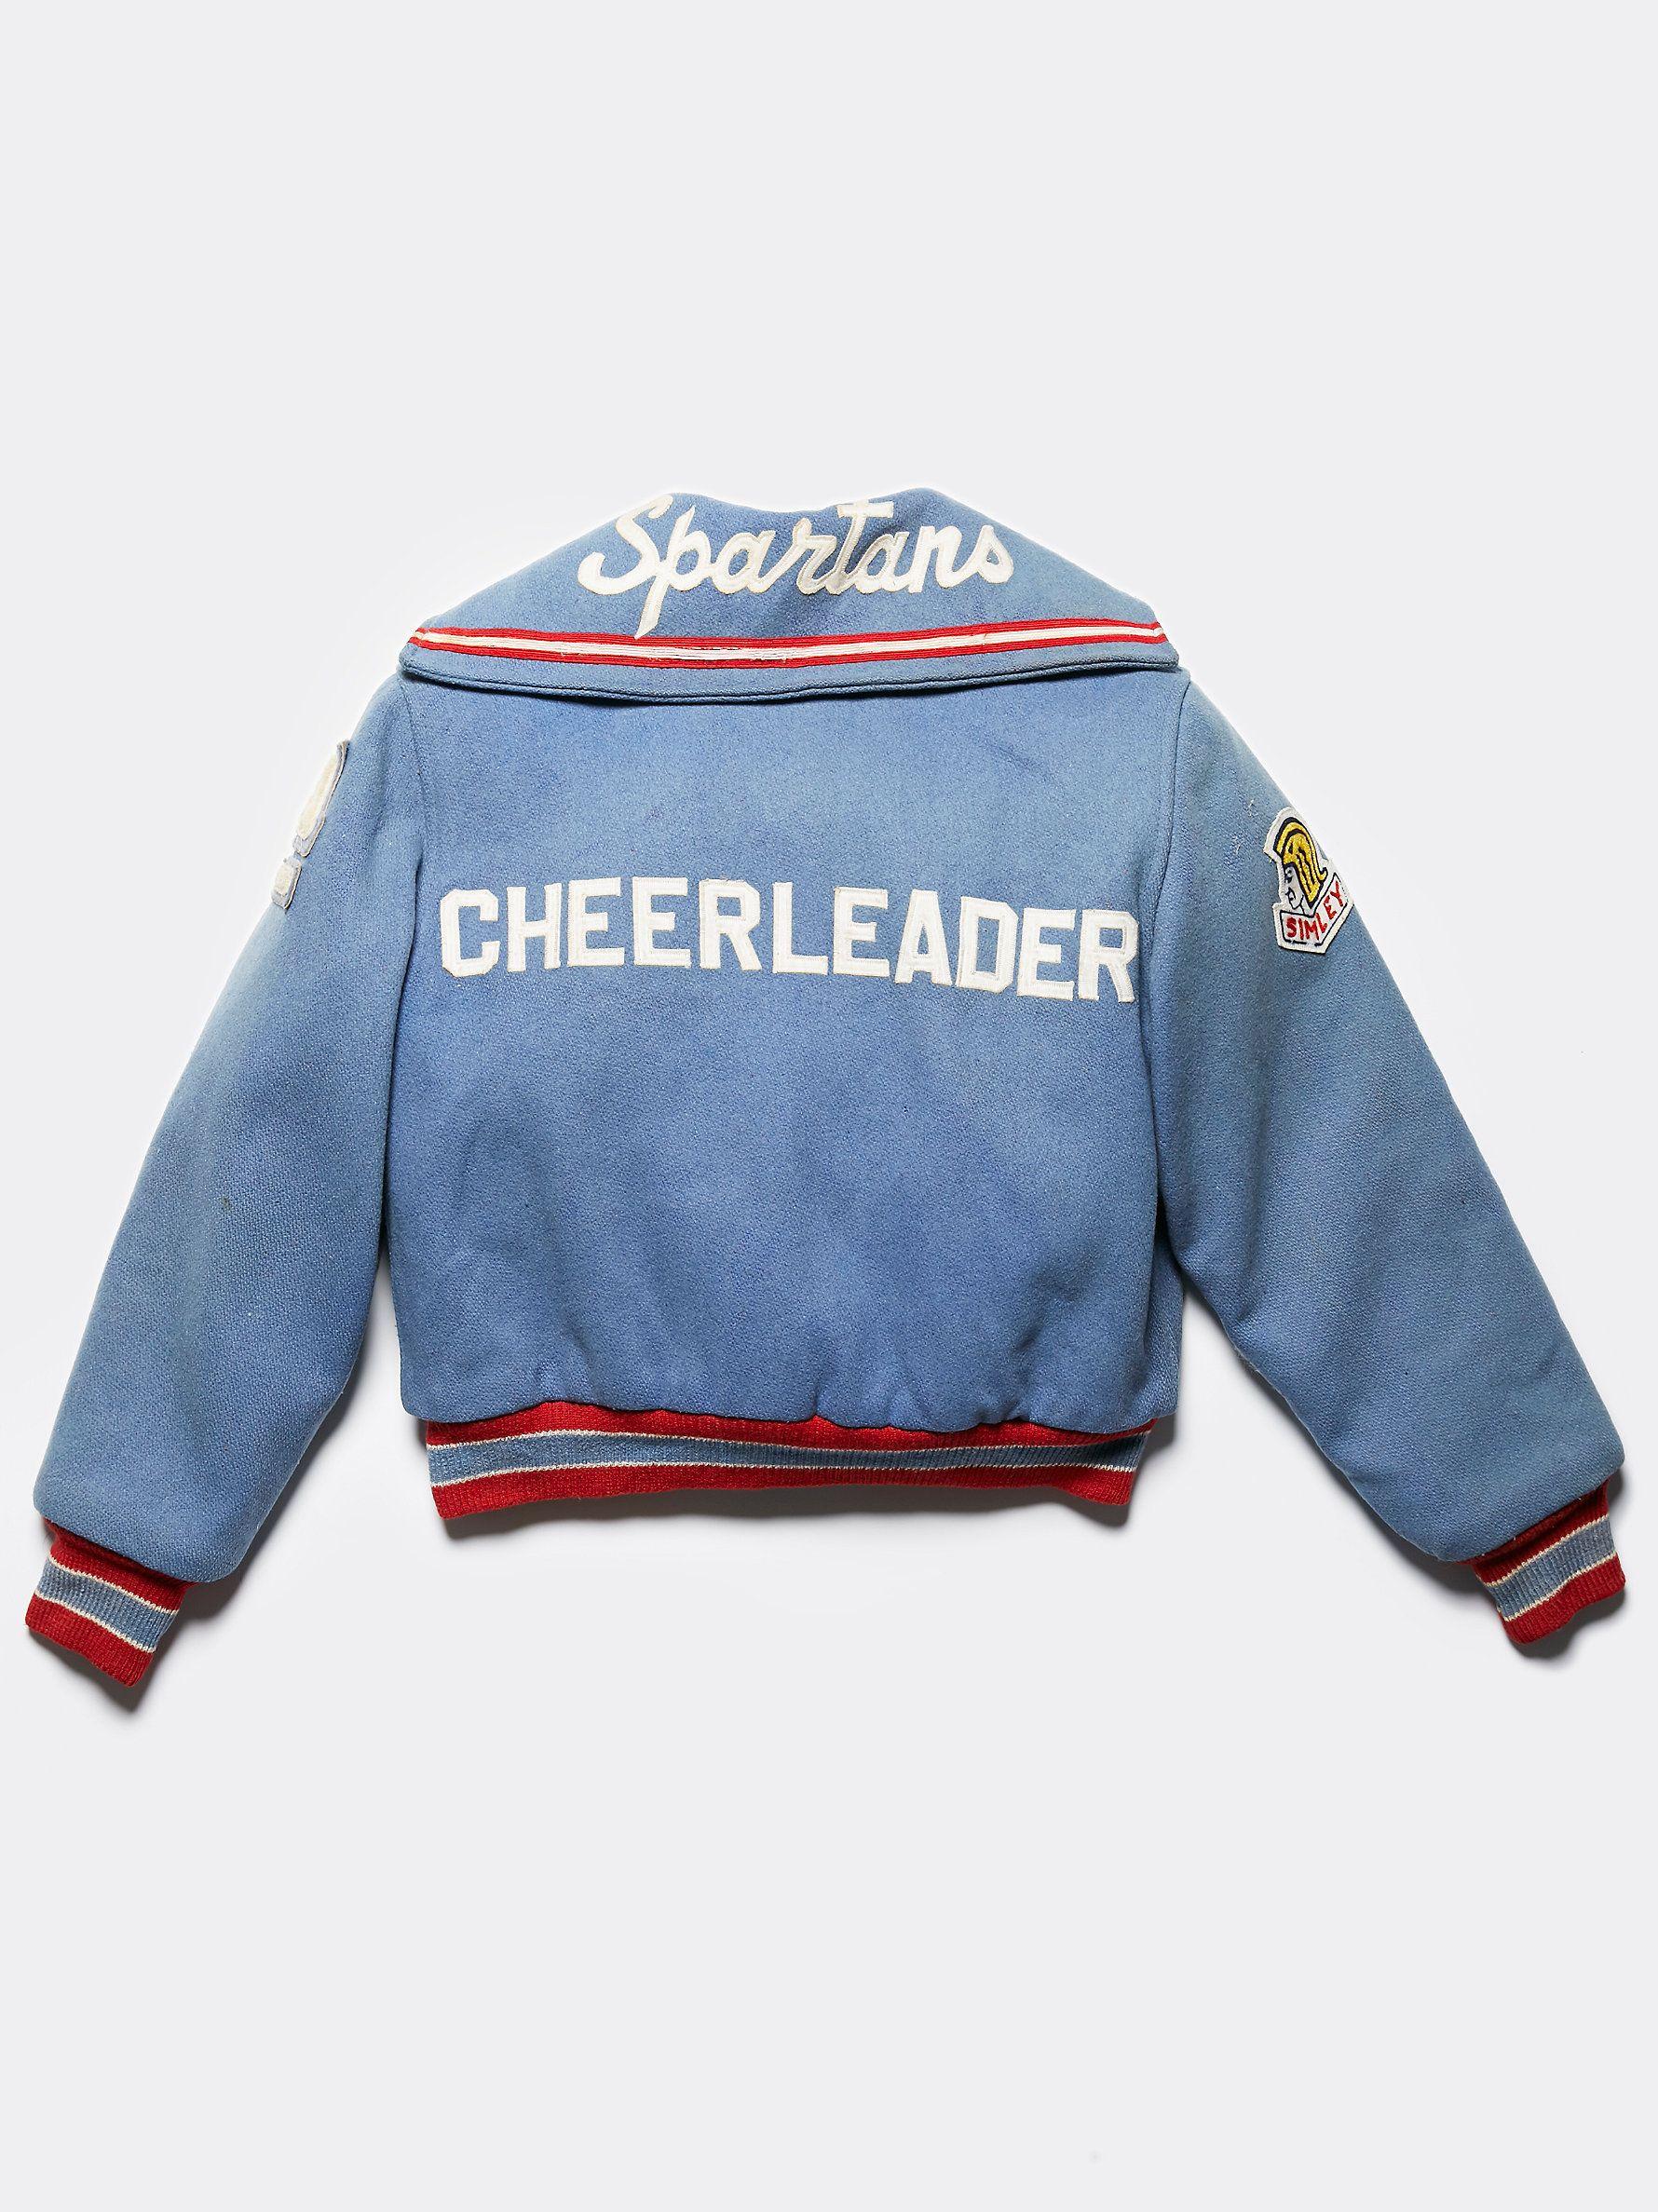 443b90b8680 Vintage 1960s Cheer Letterman Jacket   retro stuff   Jackets, Cheer ...